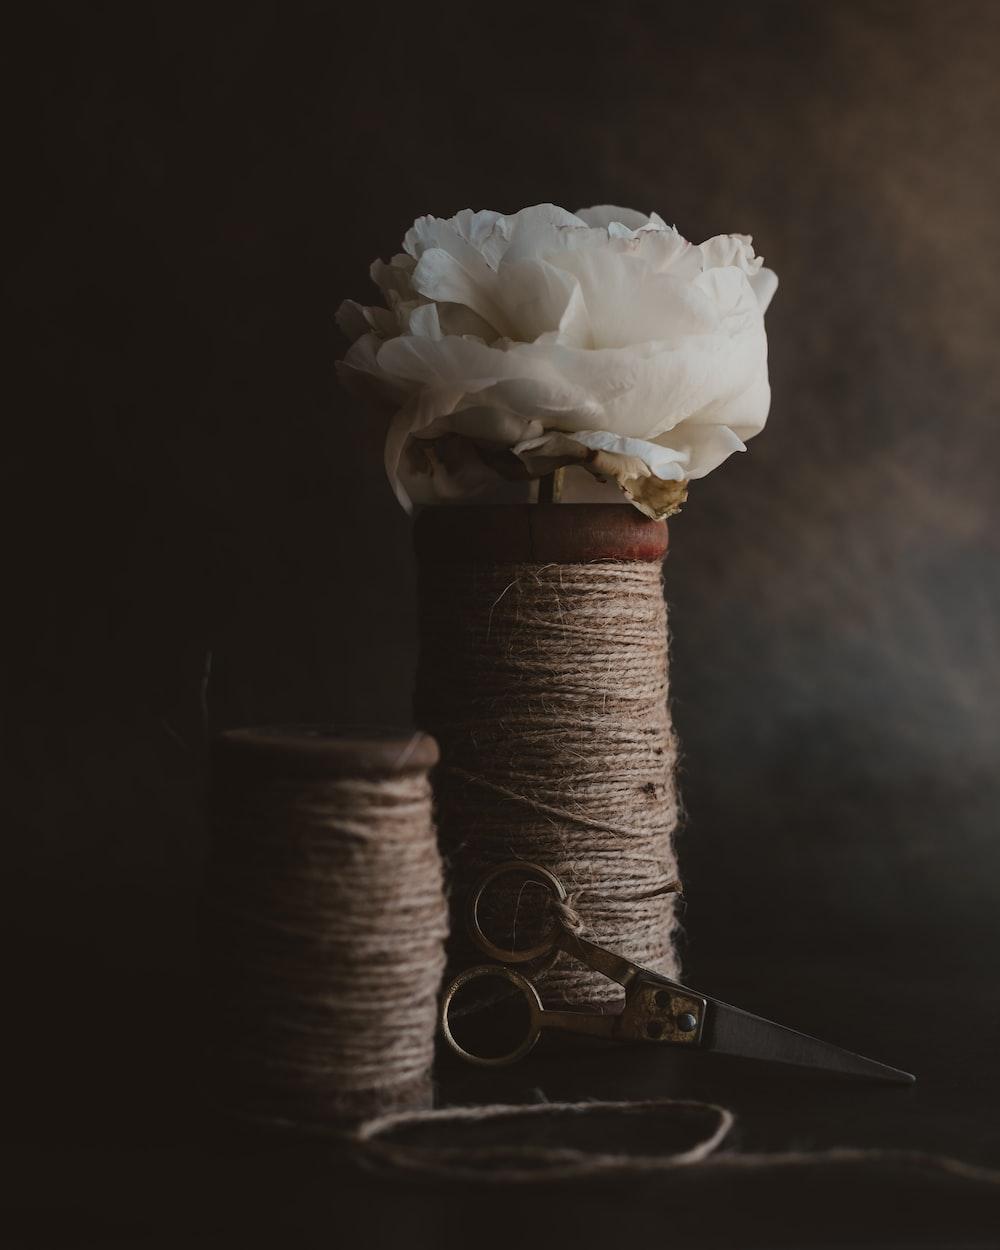 white rose on brown thread